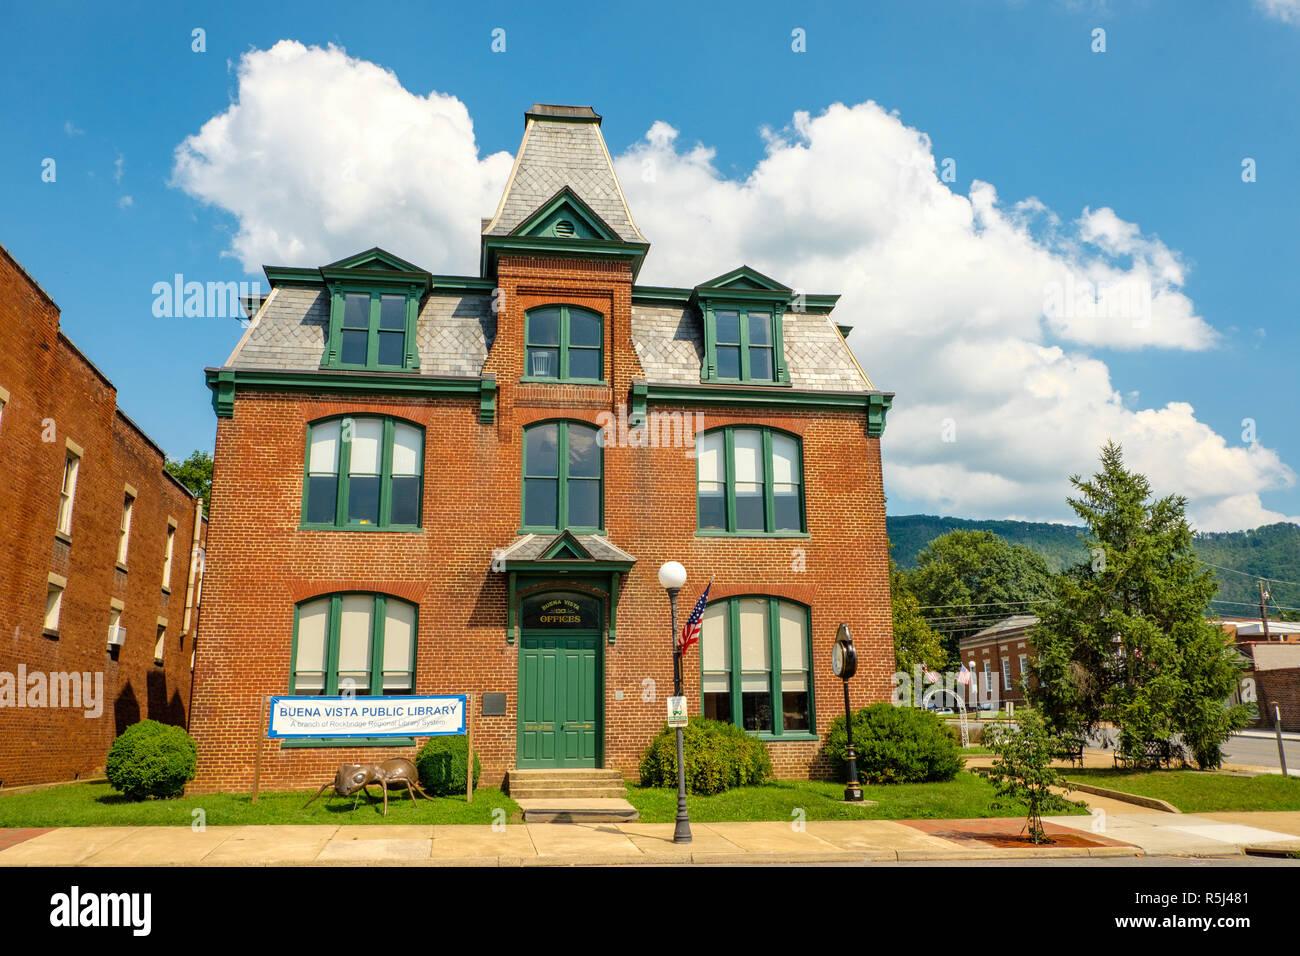 Buena Vista Public Library, Old Couthouse, 2110 Magnolia Avenue, Buena Vista, Virginia - Stock Image